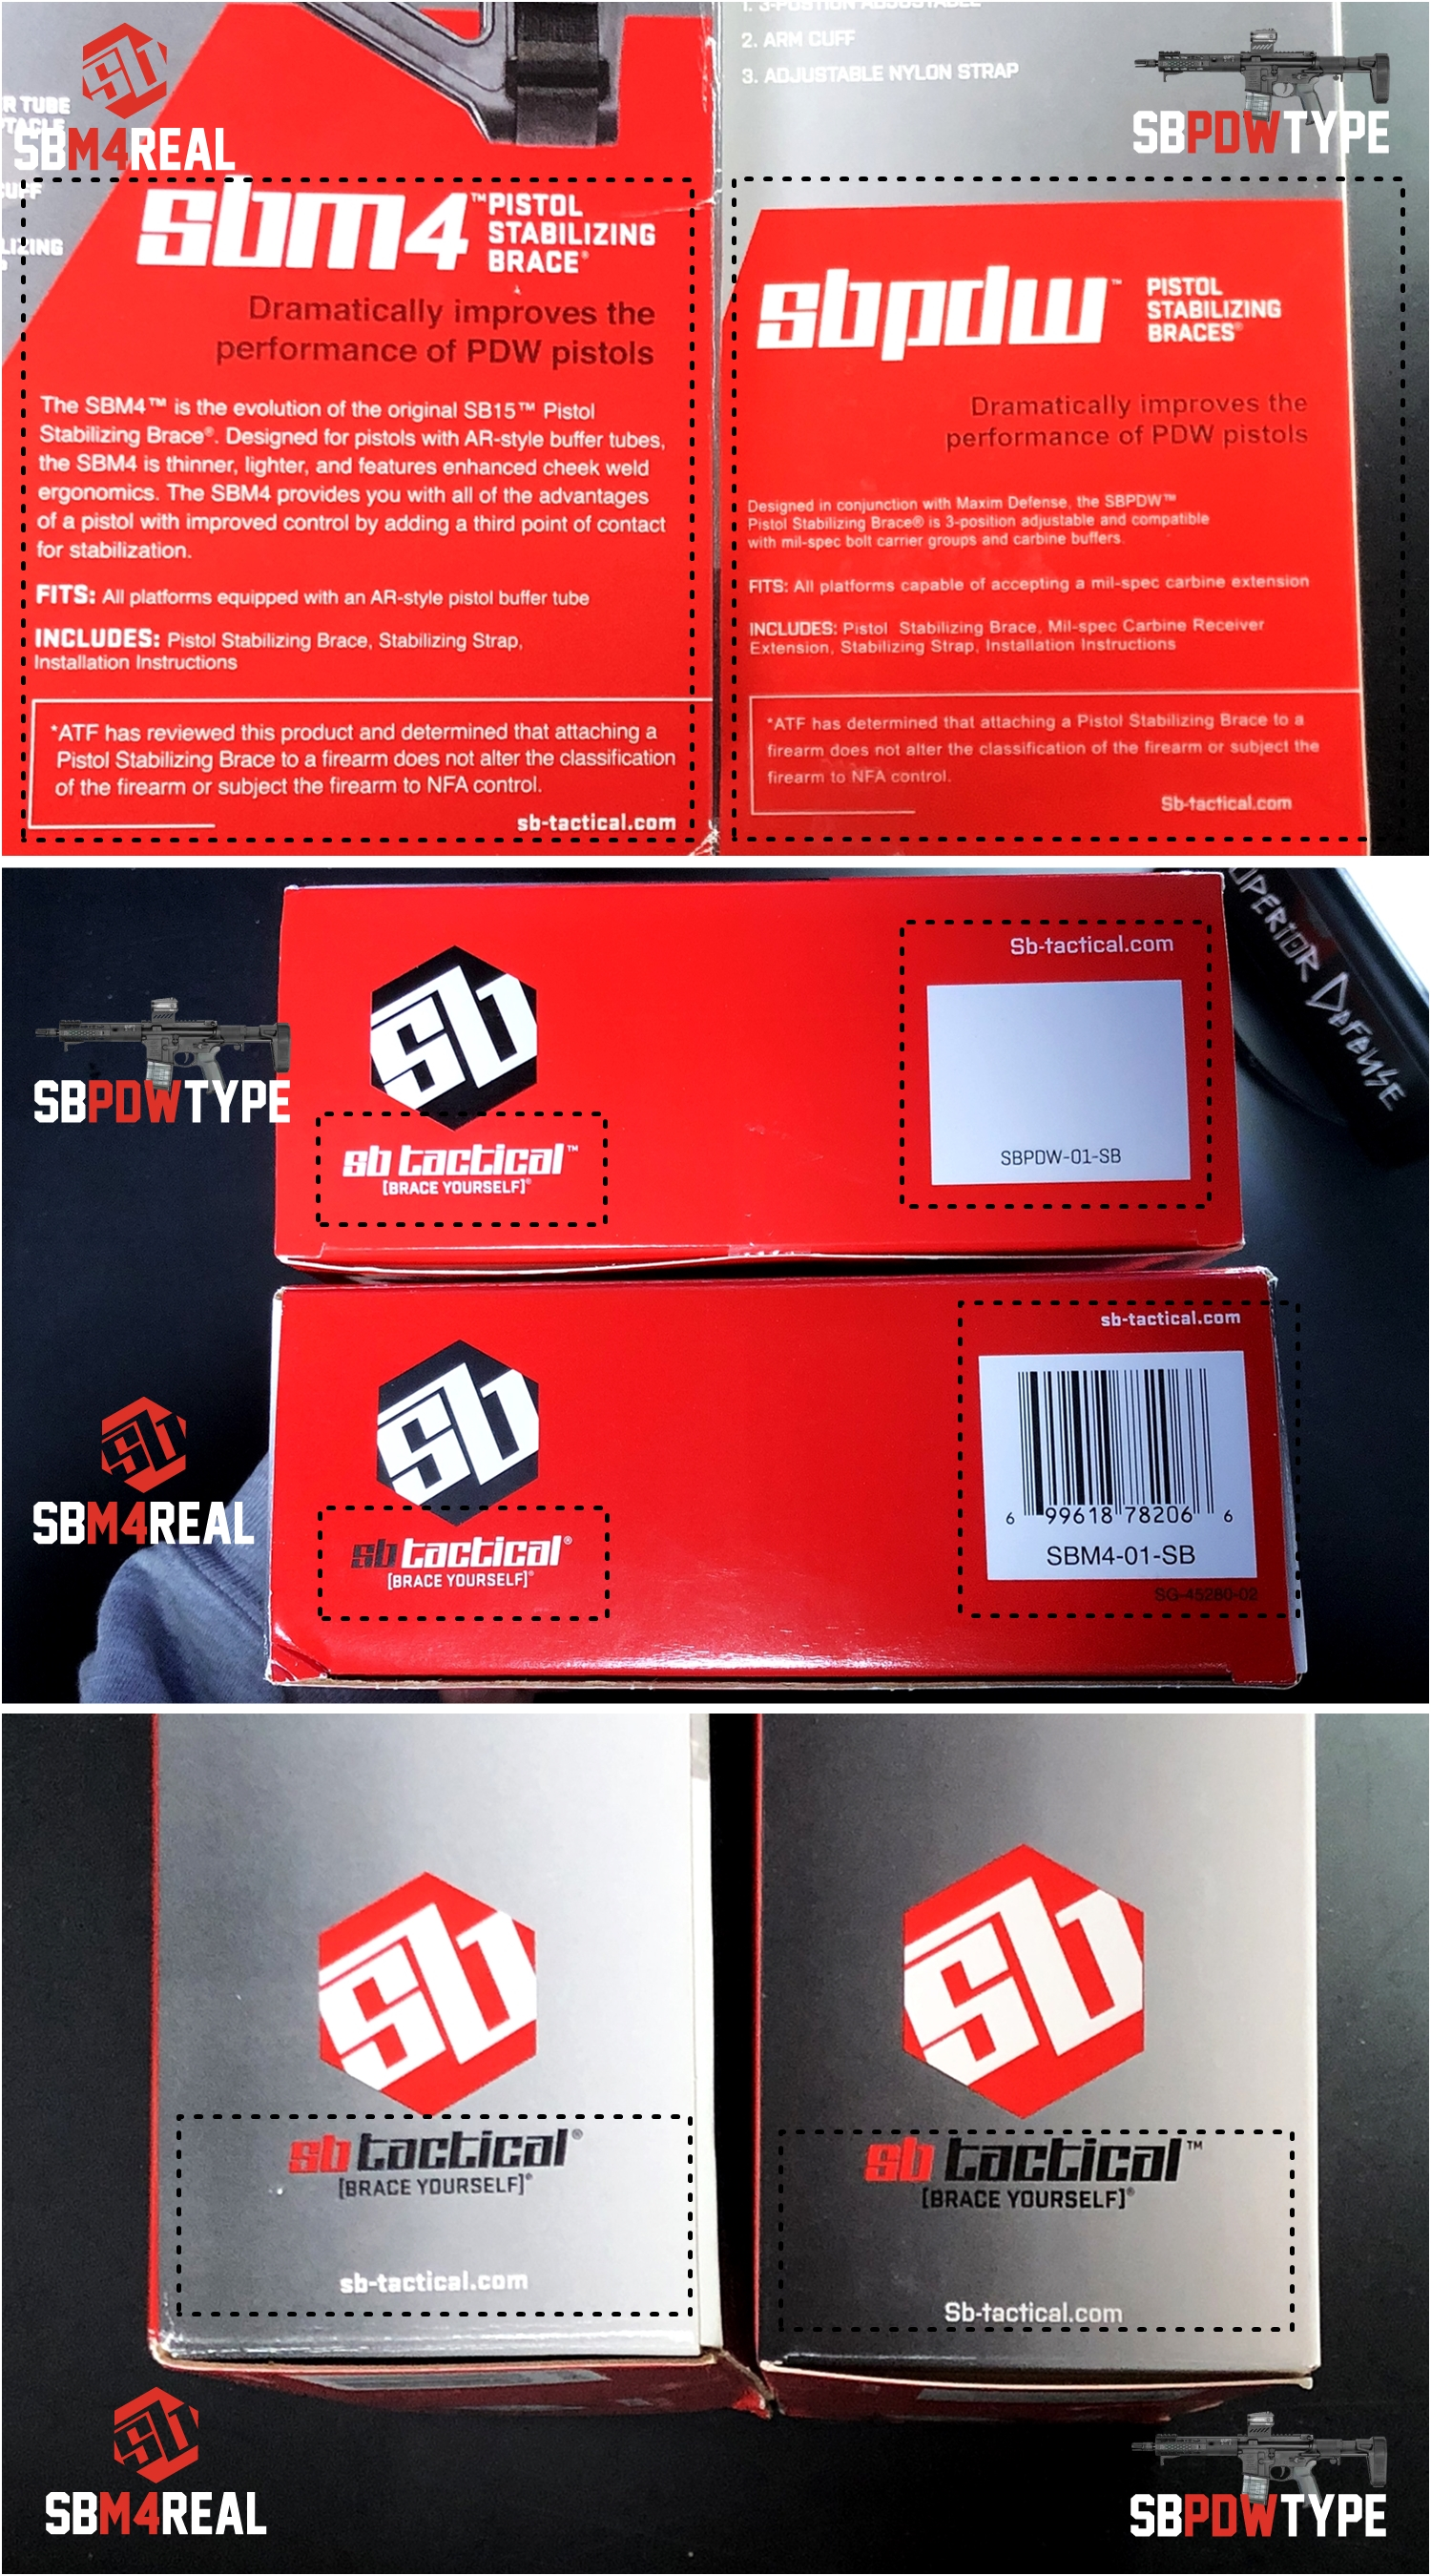 4 SB TACTICAL SB-PDW TYPE!! ちょっと気になって 購入~検証~DIY してみた!! STD電動ガン専用 M4 AR-15 スタビブレース バットストック & NOVESKE GEN3 MB専用 ポン付け ストック スリング プレート作製!!